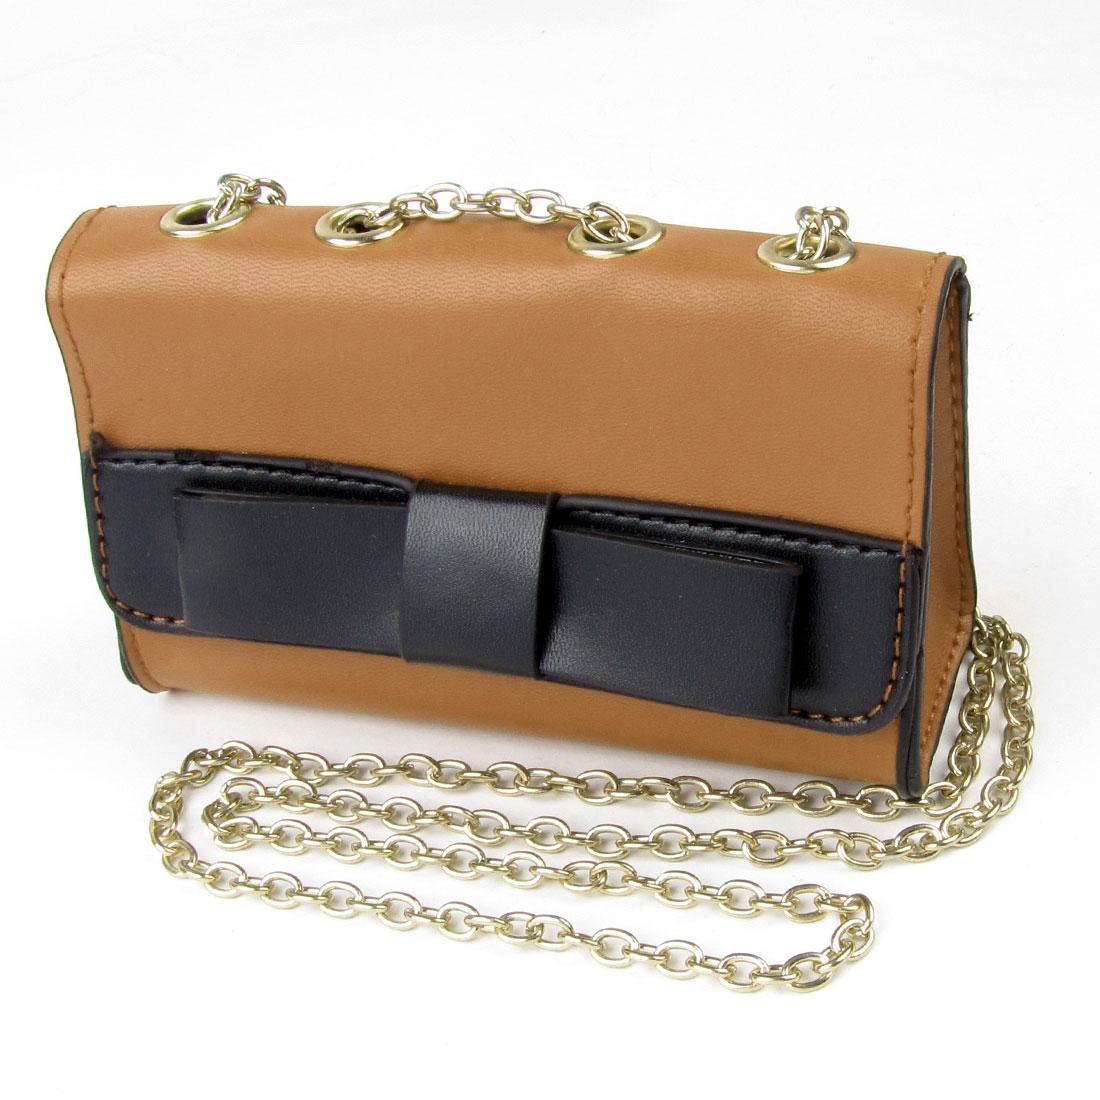 Black Bowknot Decor Faux Leather Magnetic Stud Closure Shoulder Bag Brown for Lady